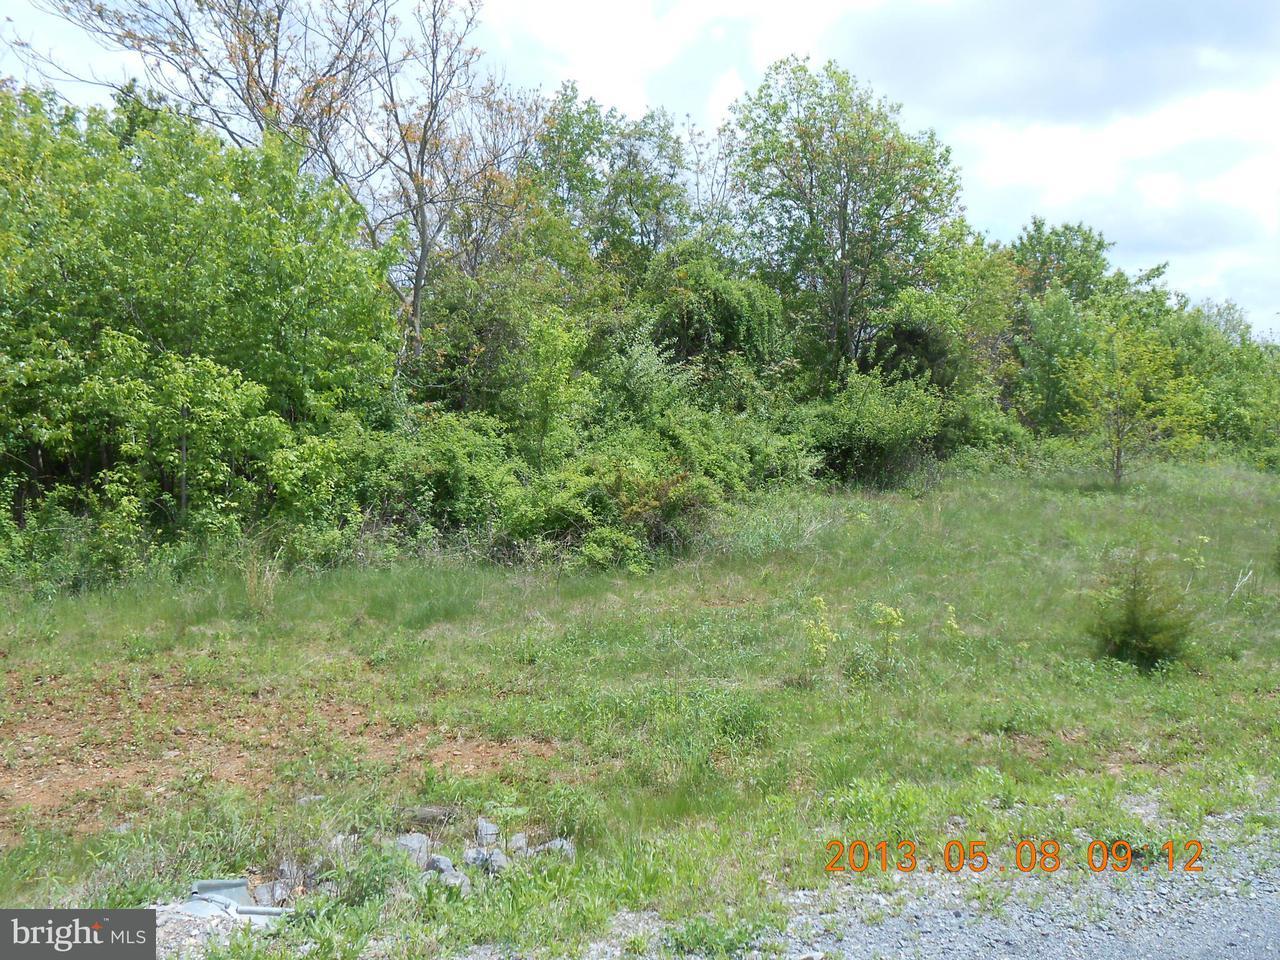 Land for Sale at 30lot # Apple Jack Ct Mercersburg, Pennsylvania 17236 United States